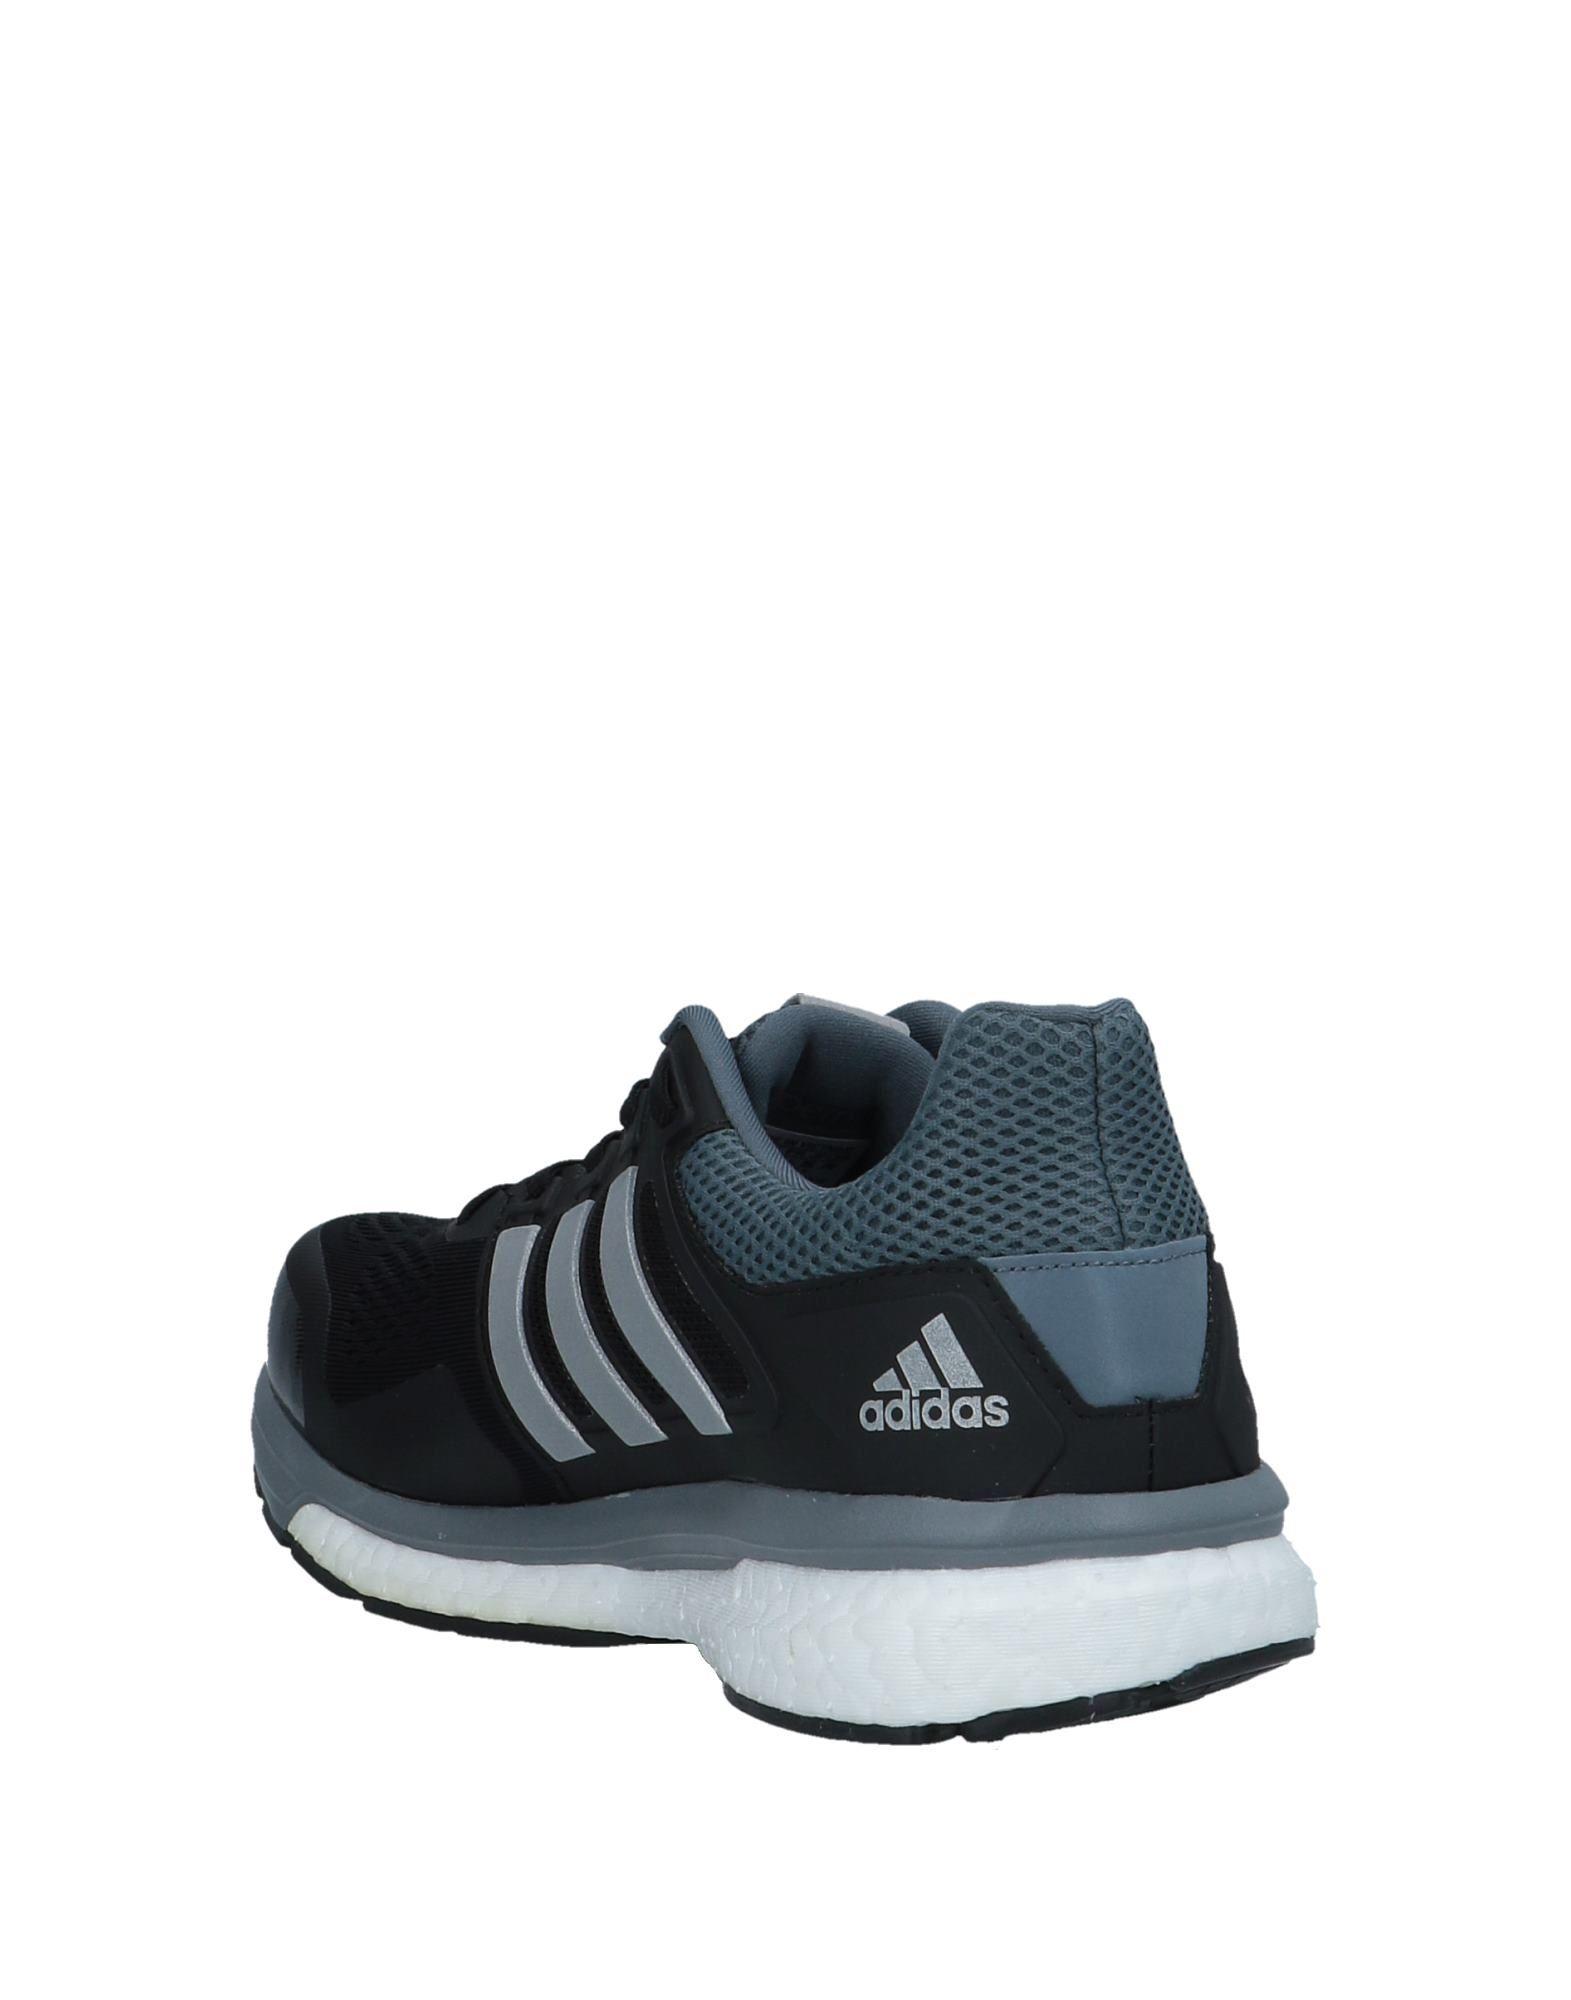 Adidas Sneakers Herren Herren Sneakers  11541752EK a6e487